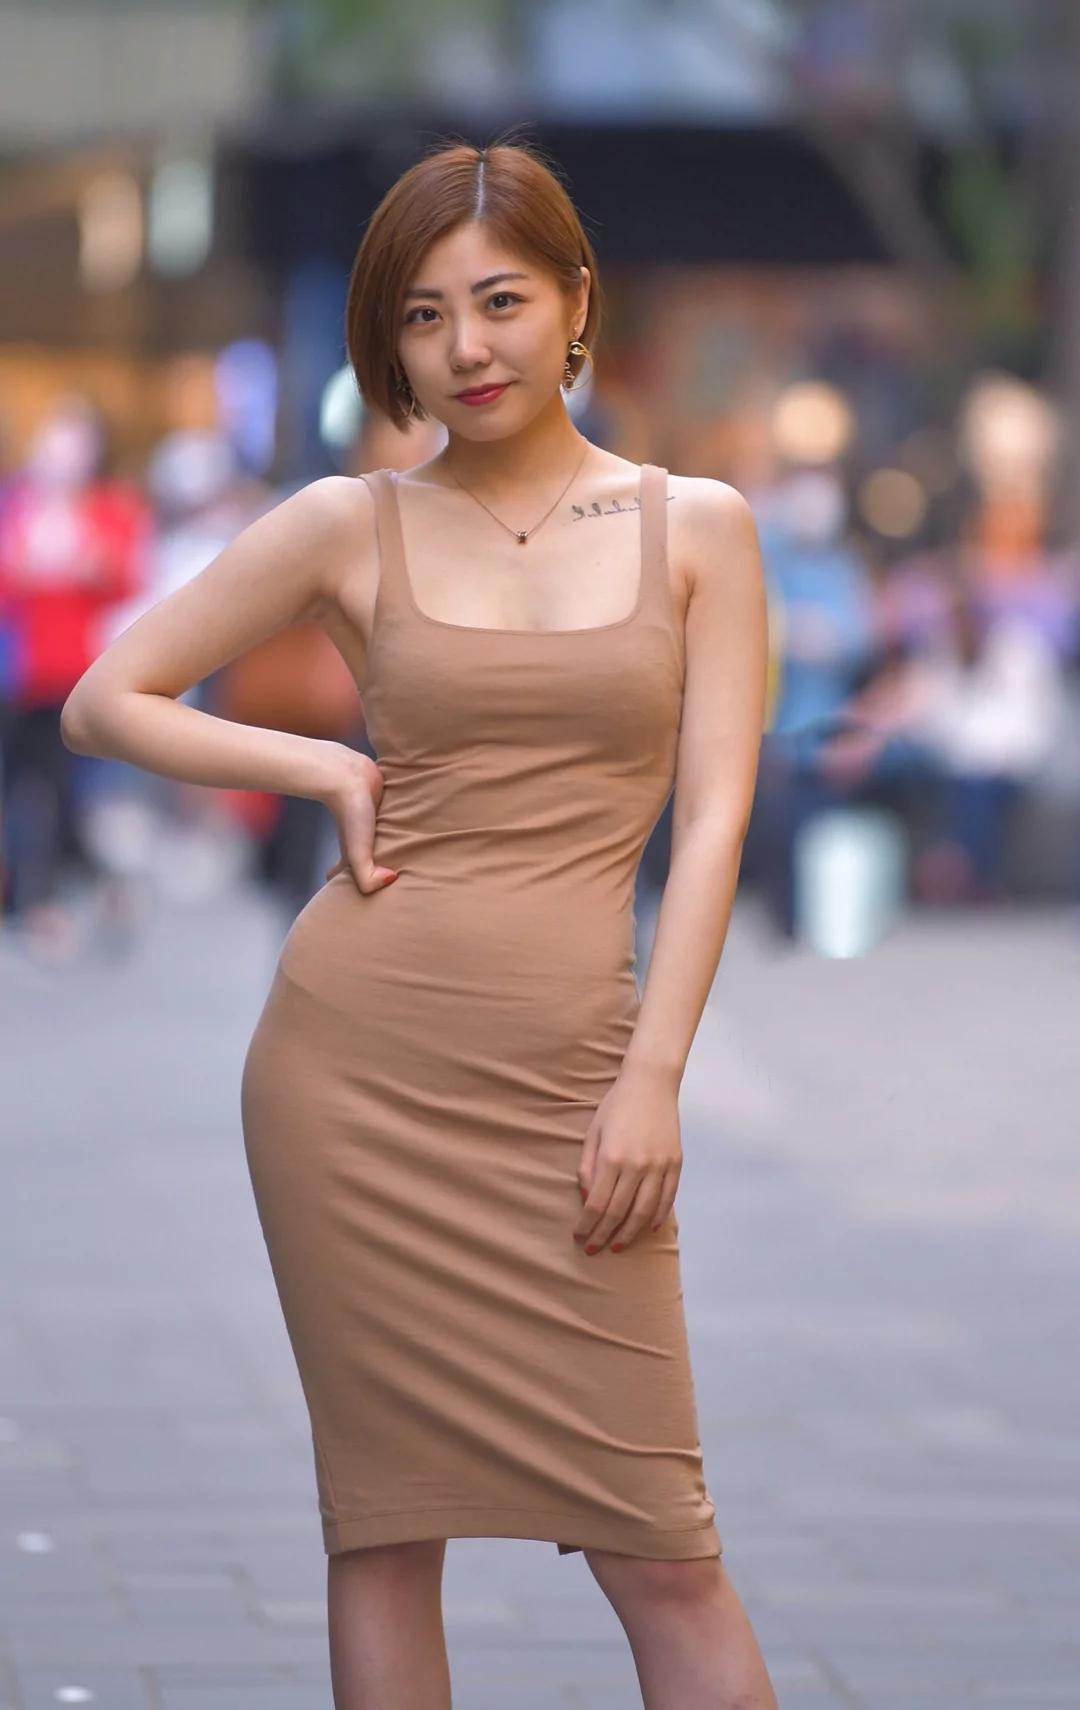 meinuse_咖色的吊带长裙,尽显美女成熟的气质.